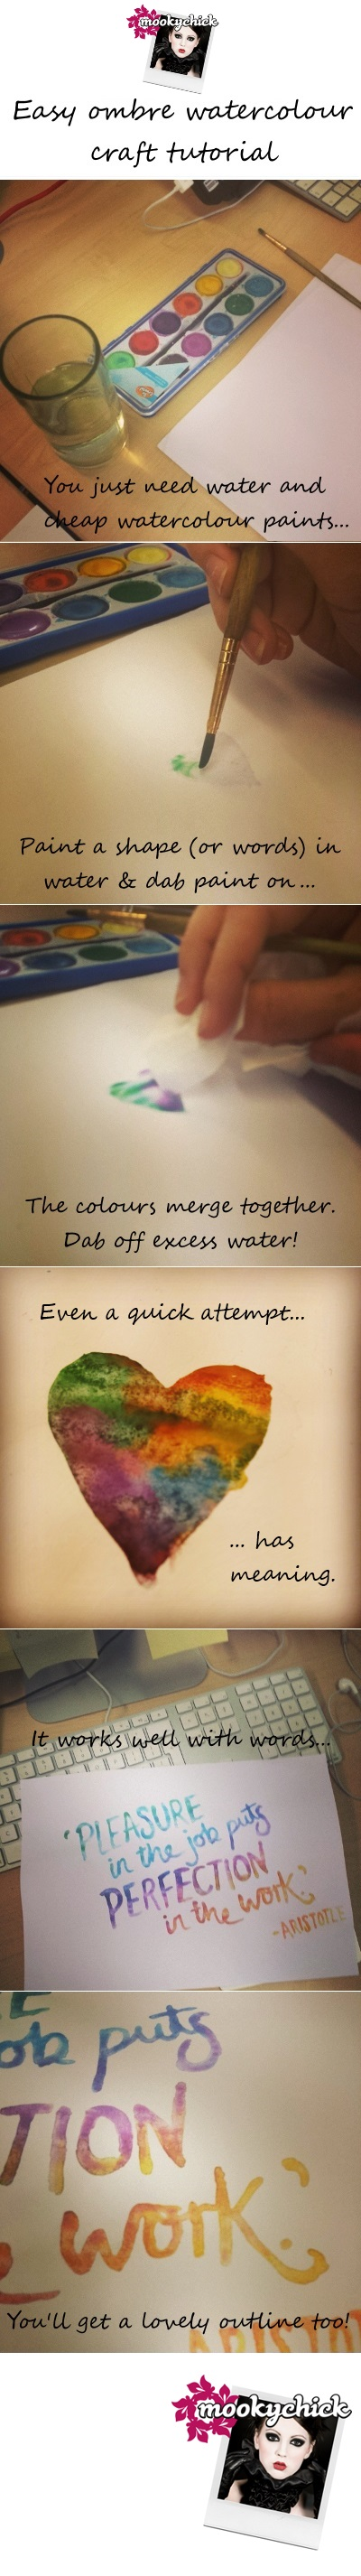 rainbow watercolour craft